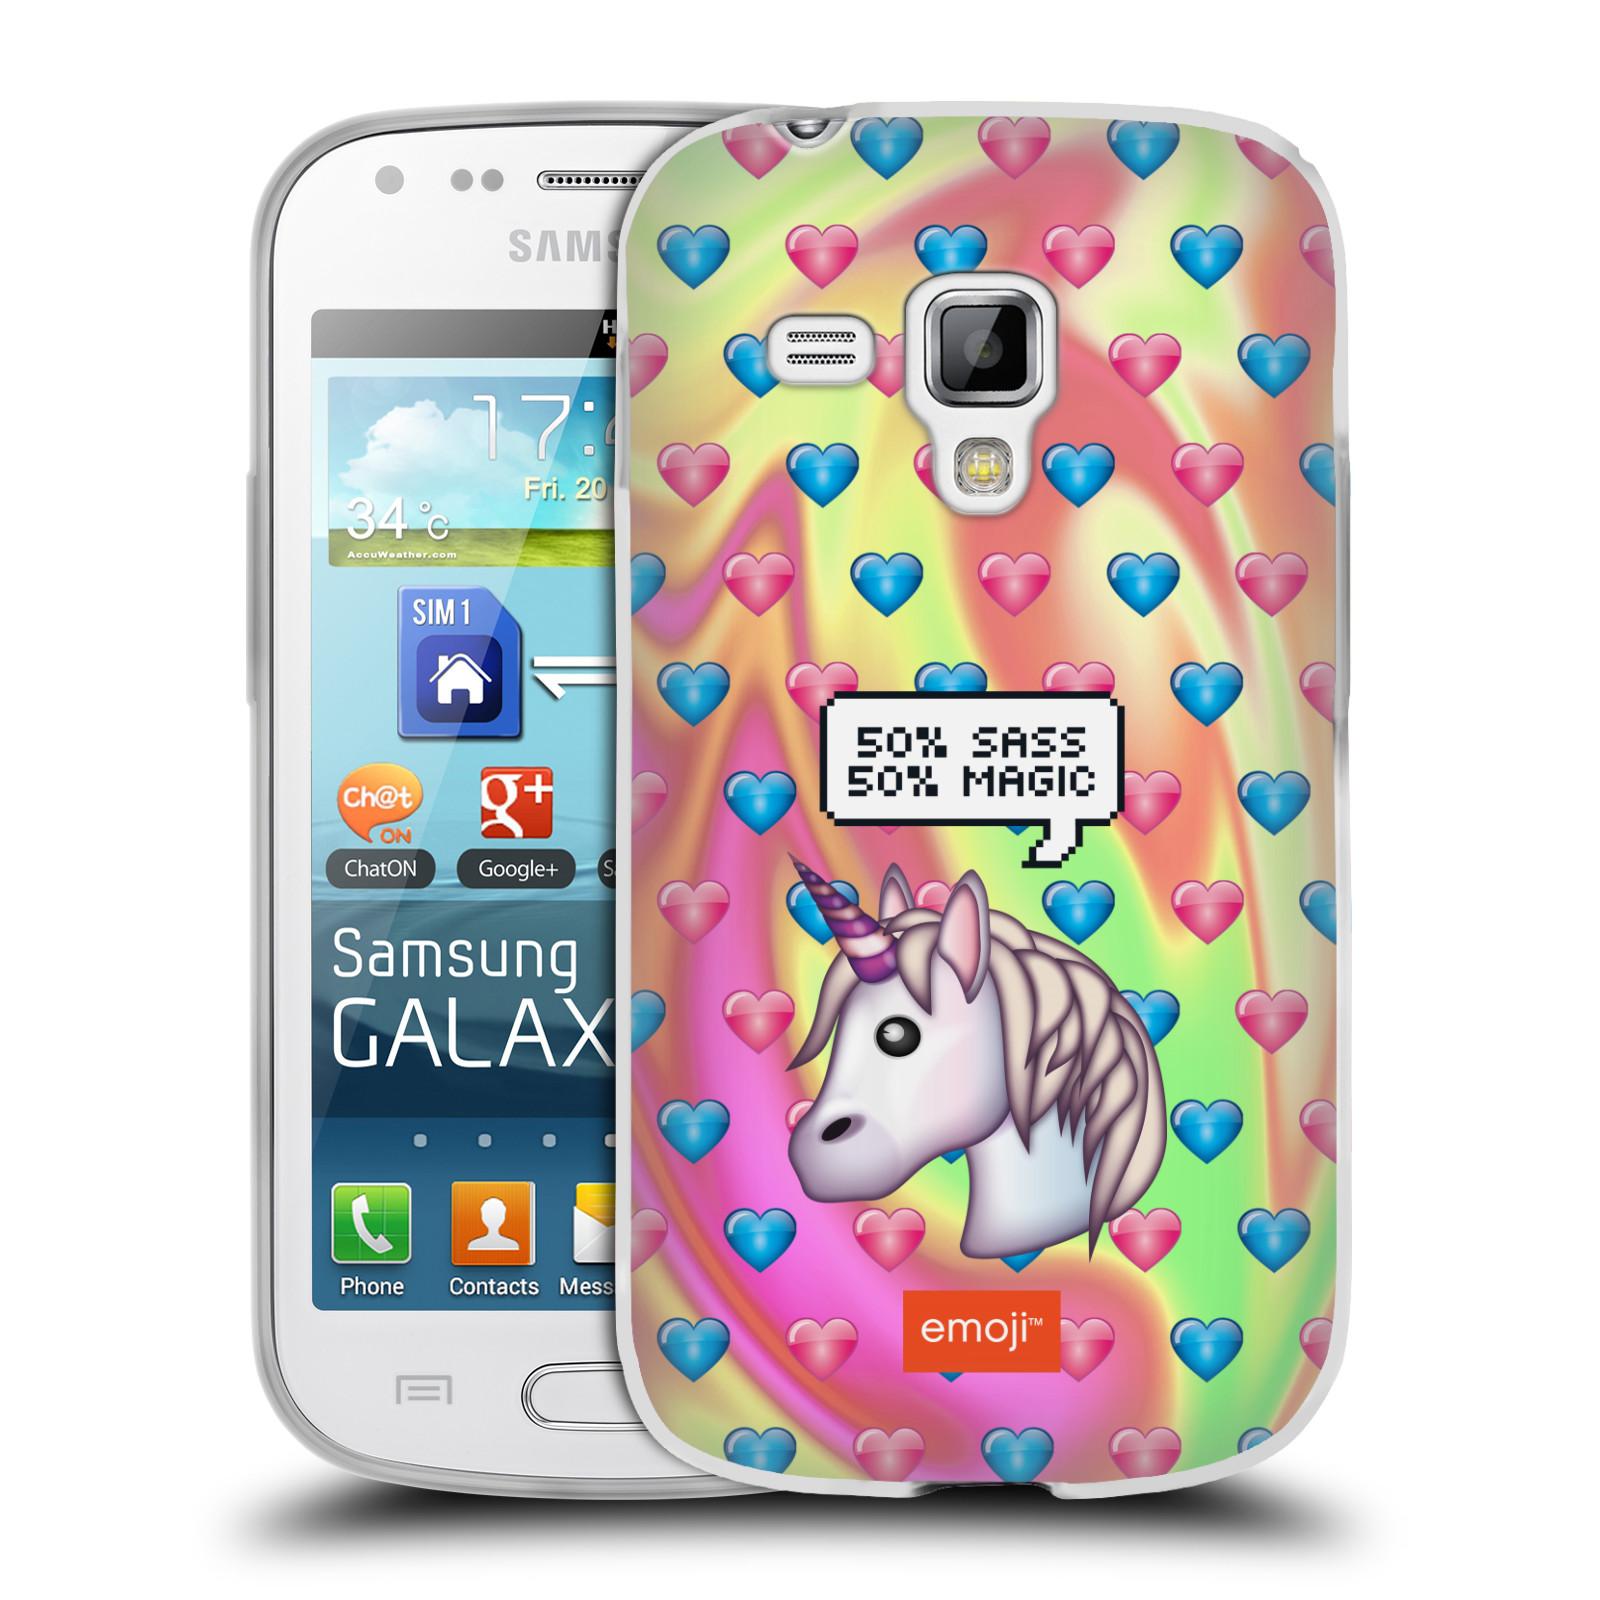 Silikonové pouzdro na mobil Samsung Galaxy Trend HEAD CASE EMOJI - Jednorožec (Silikonový kryt či obal s oficiálním motivem EMOJI na mobilní telefon Samsung Galaxy Trend GT-S7560)